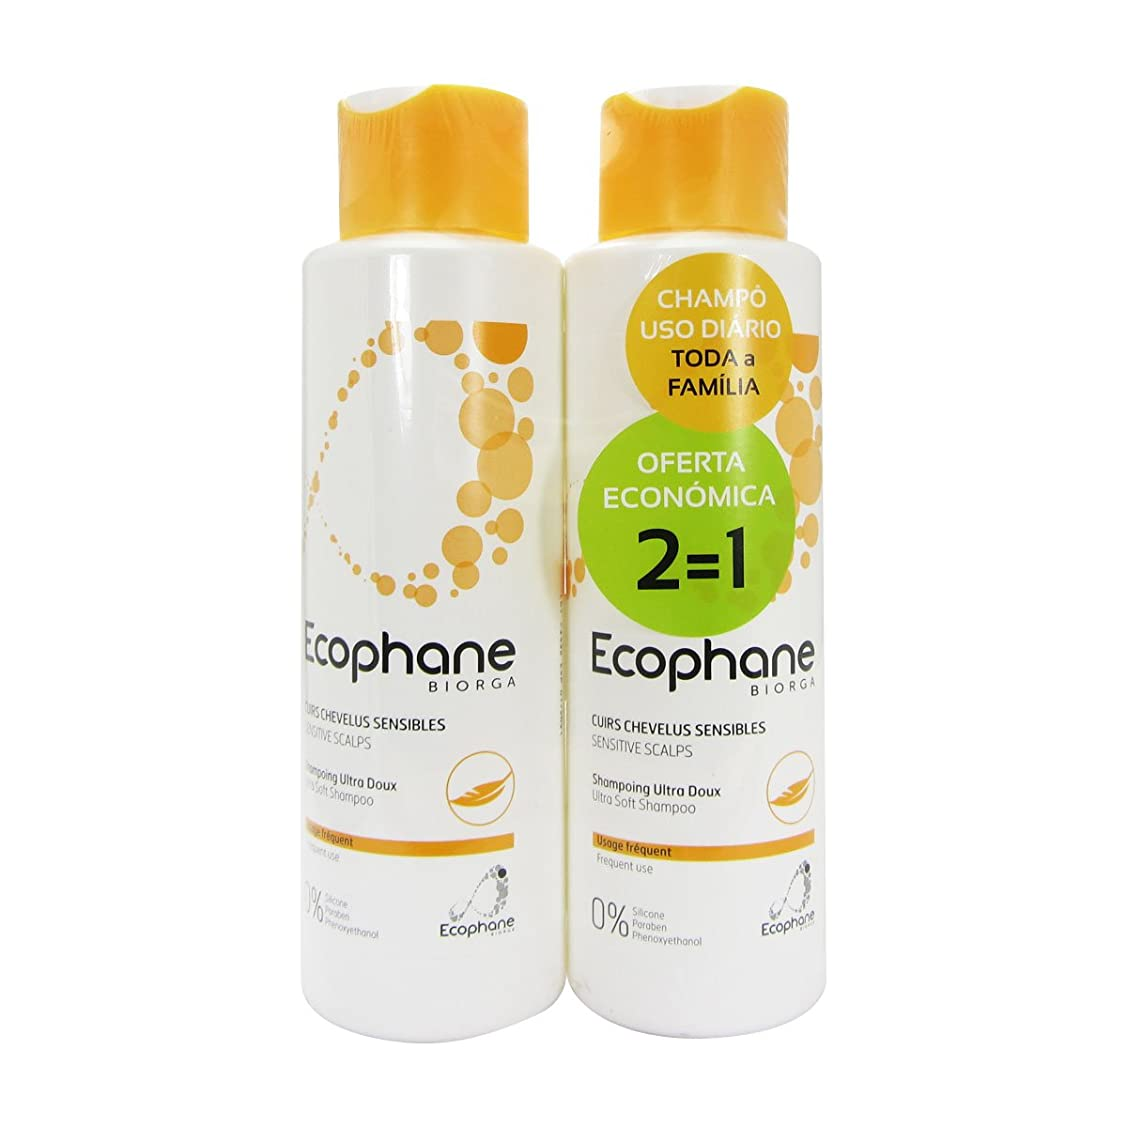 四回植物の繊細Biorga Ecophane Pack Ultra Soft Shampoo 2x500ml [並行輸入品]